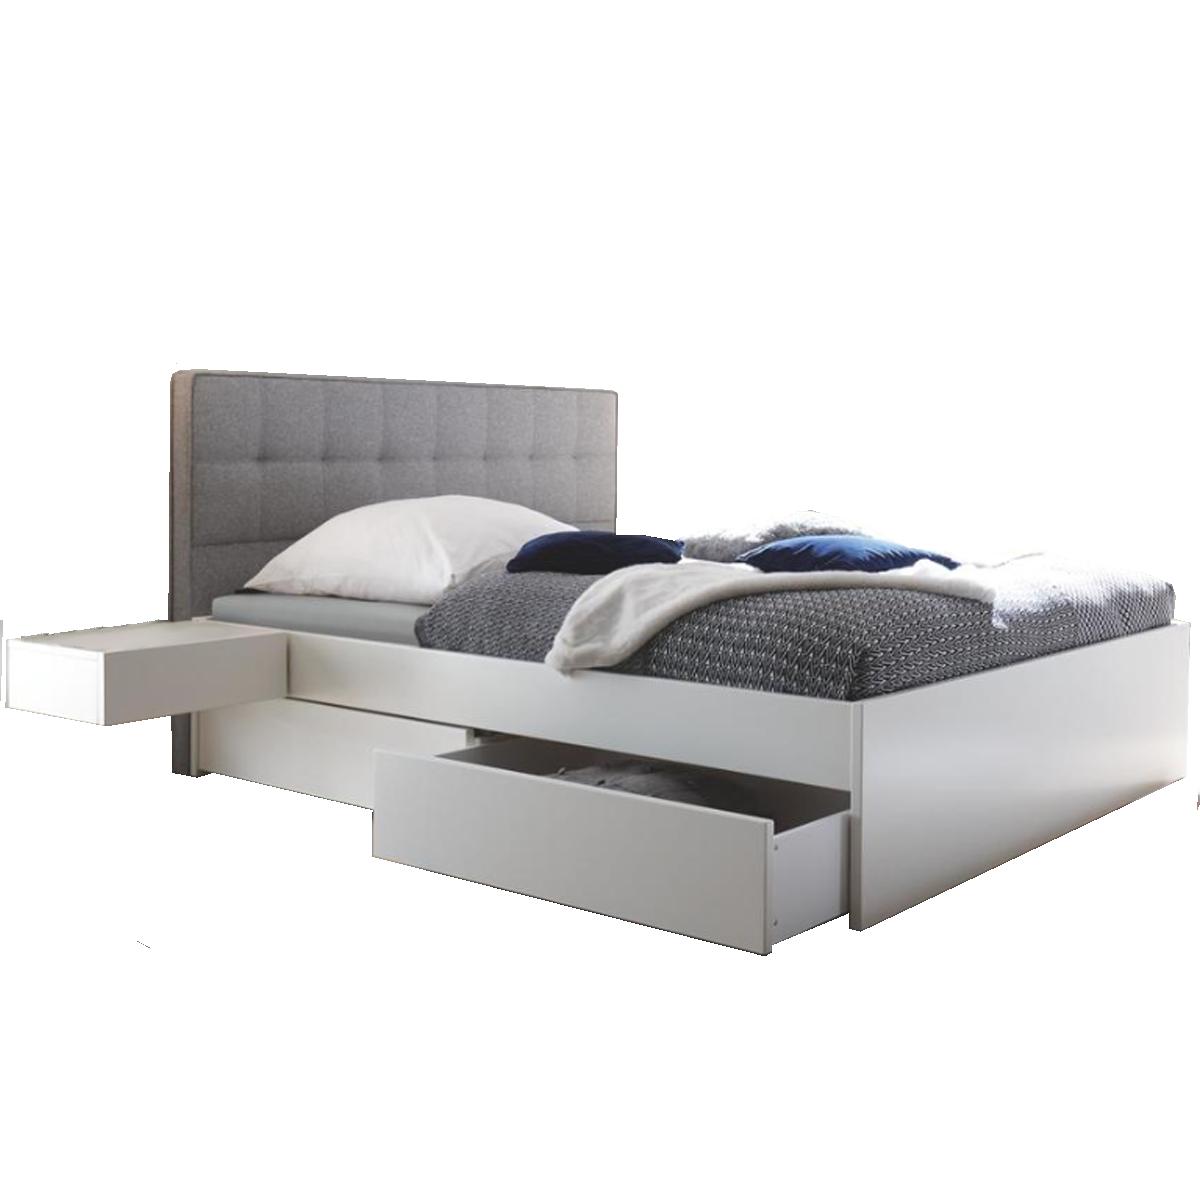 Hasena Function & Comfort Bett Elito Standard inkl. 2 ...